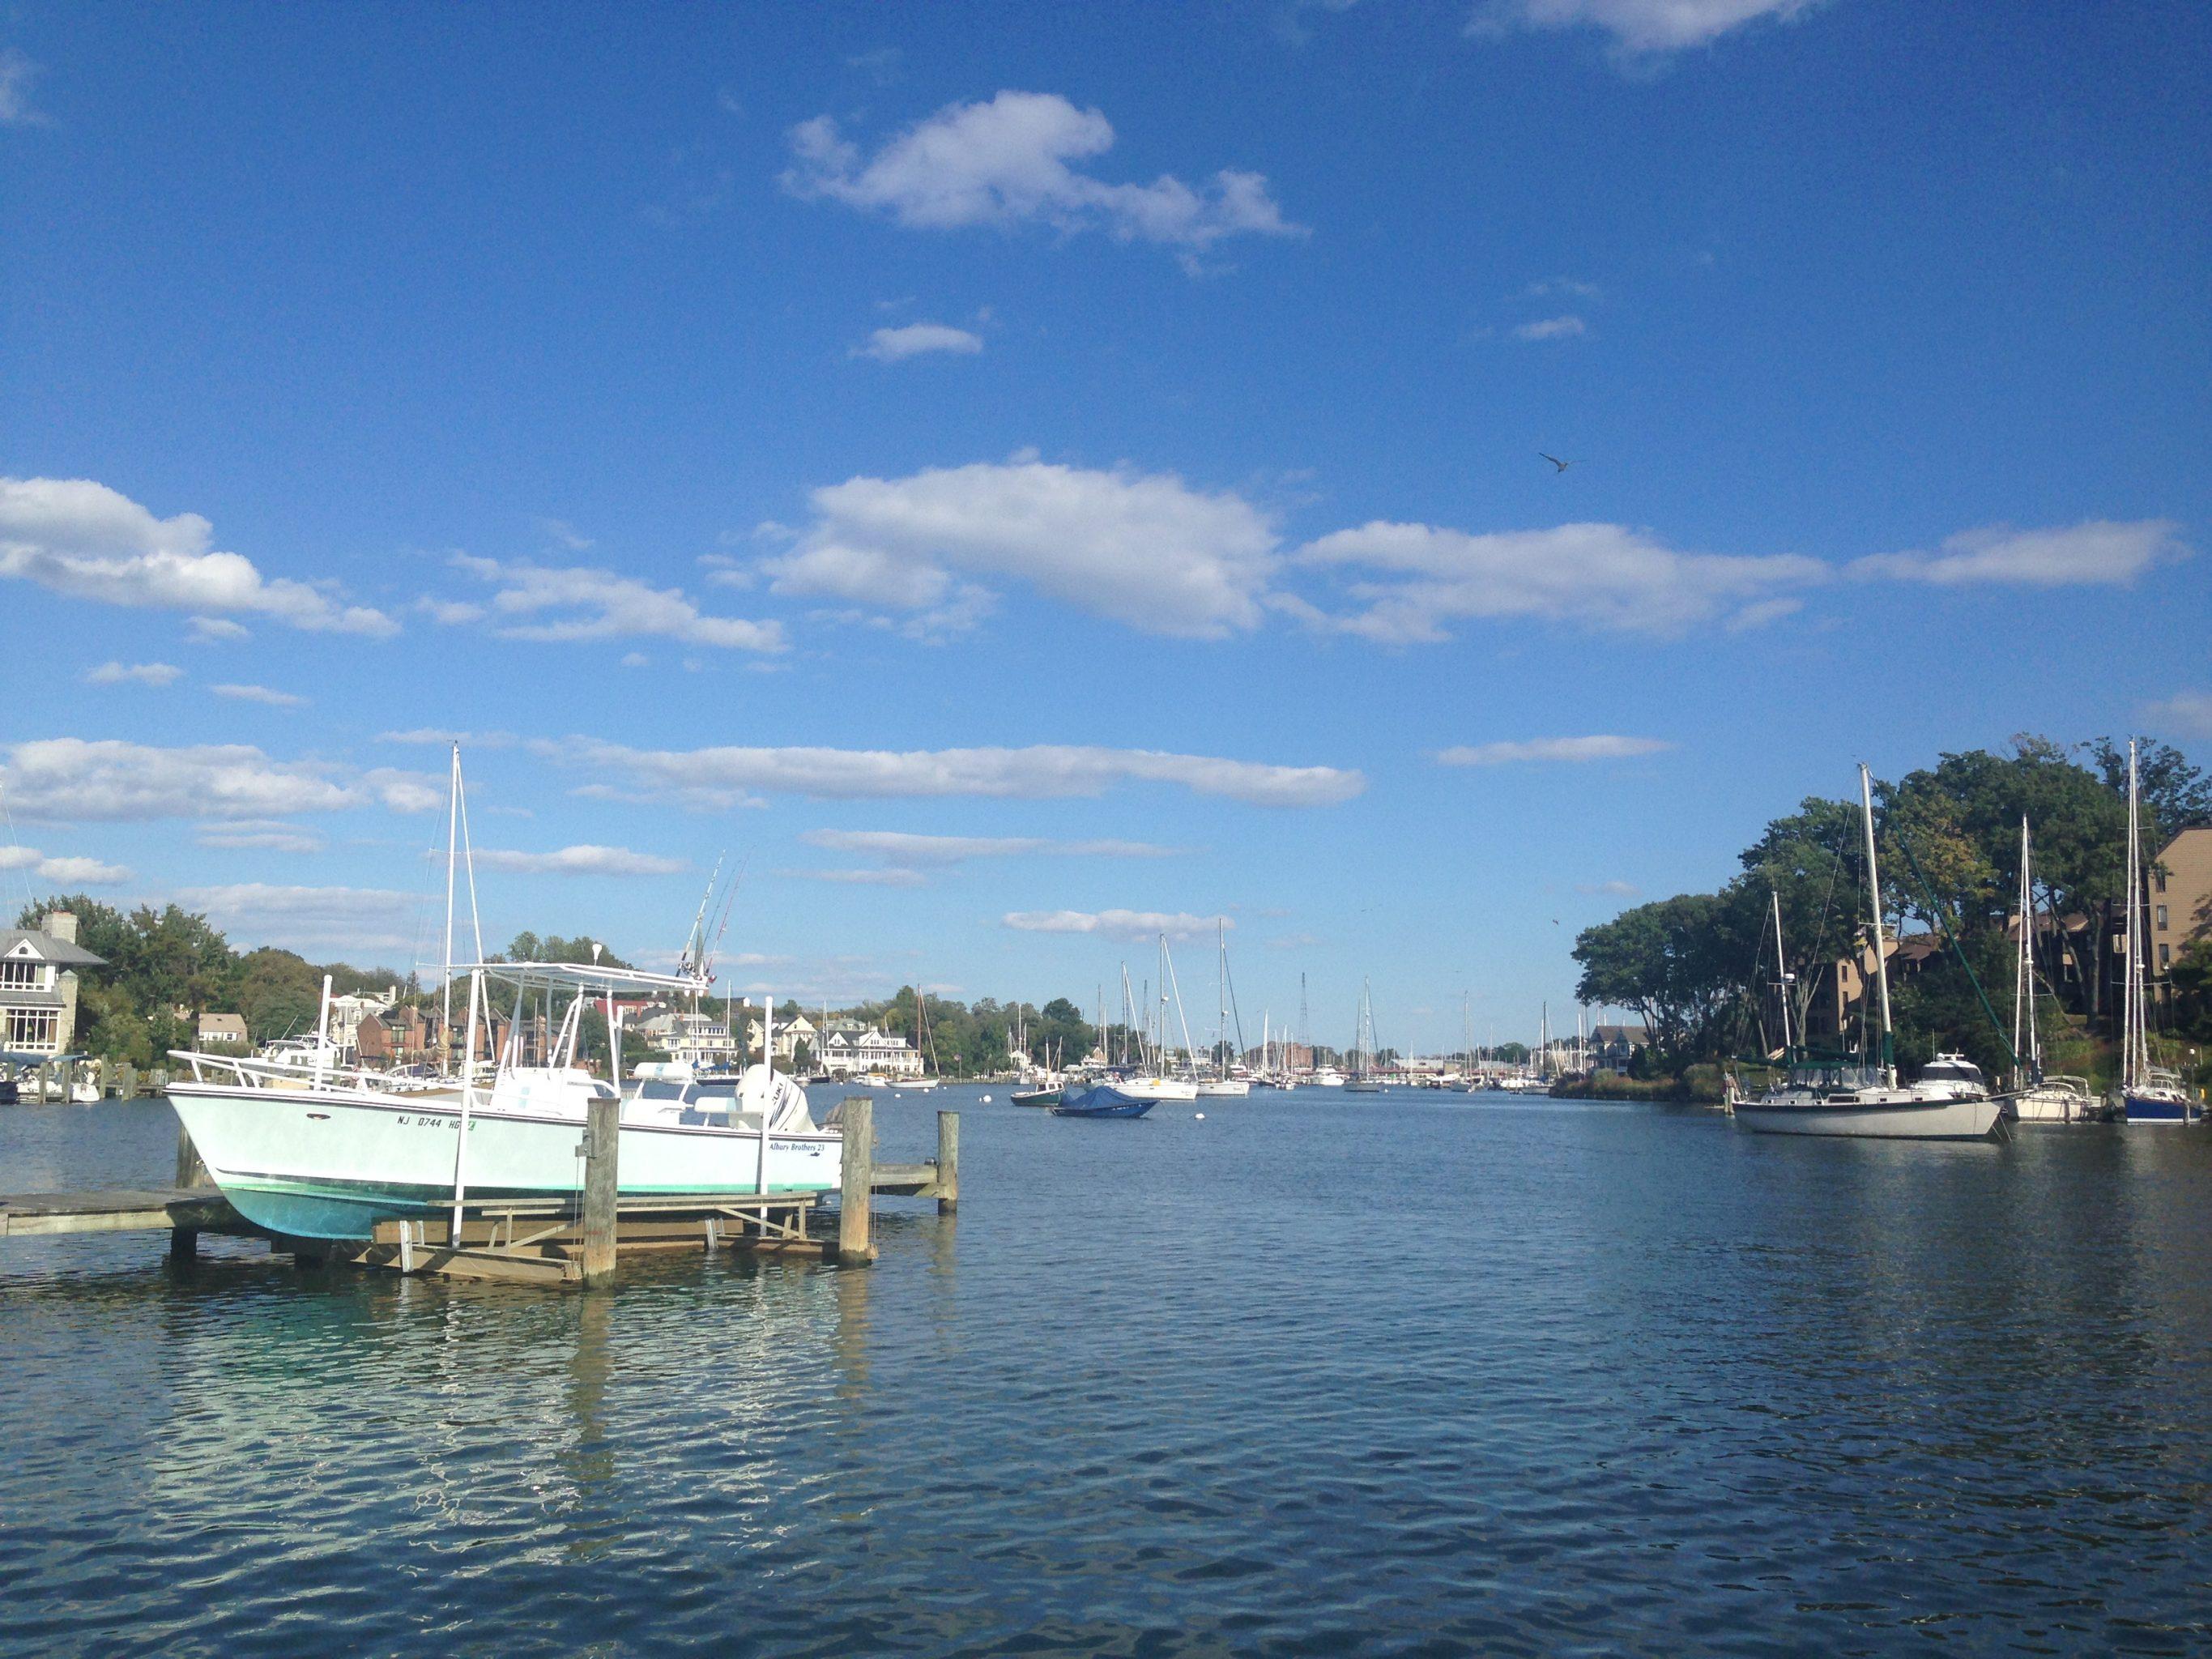 Days 127-129: Maryland & Virginia